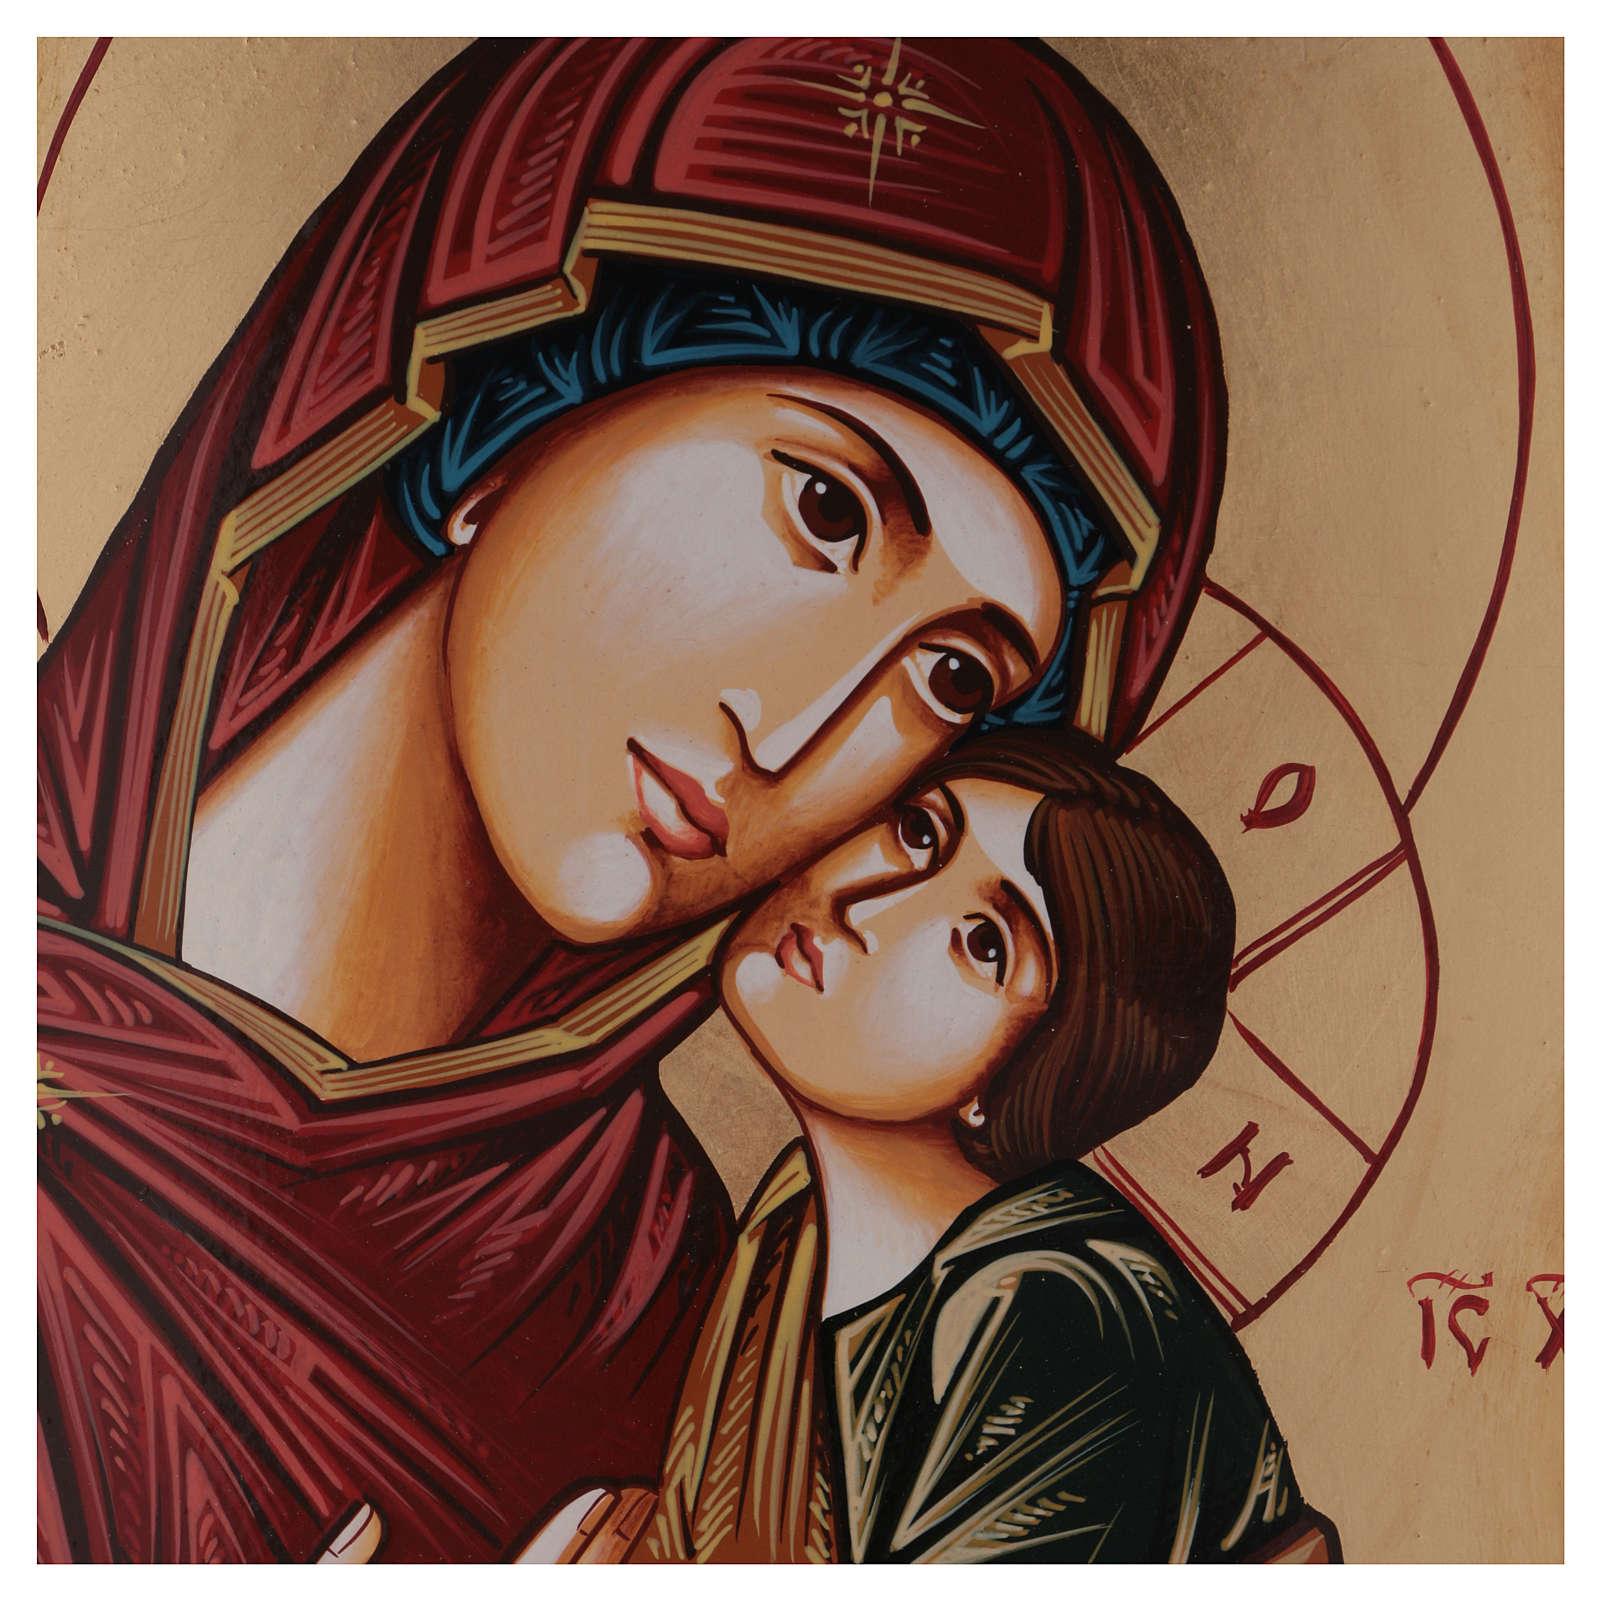 Icona Vergine Eleousa (la misericordiosa) 4